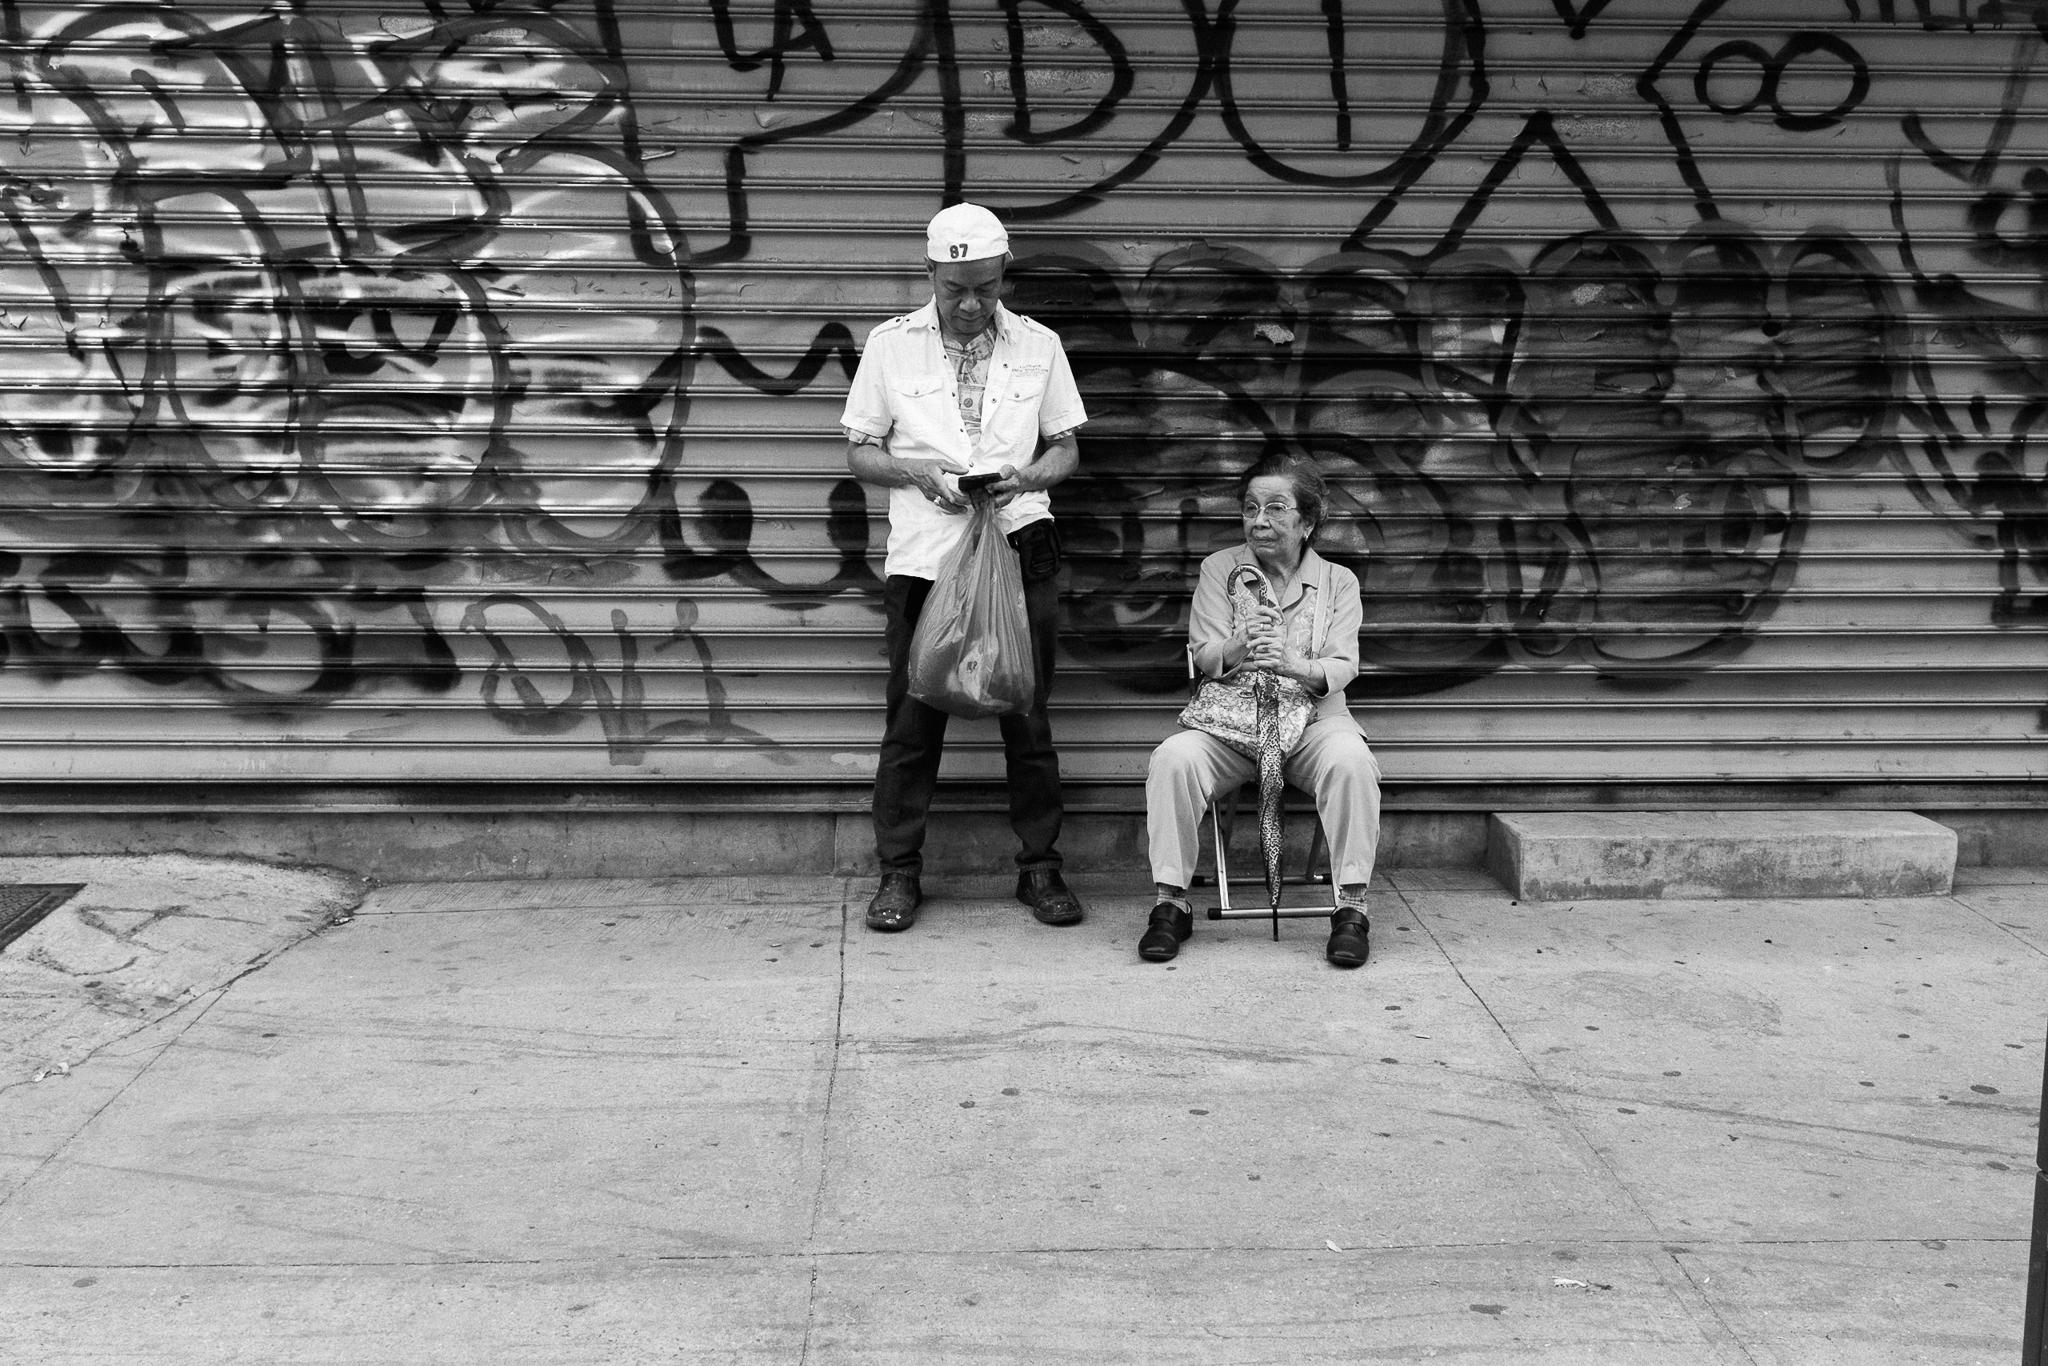 2015-05-14-NYC-1021.jpg